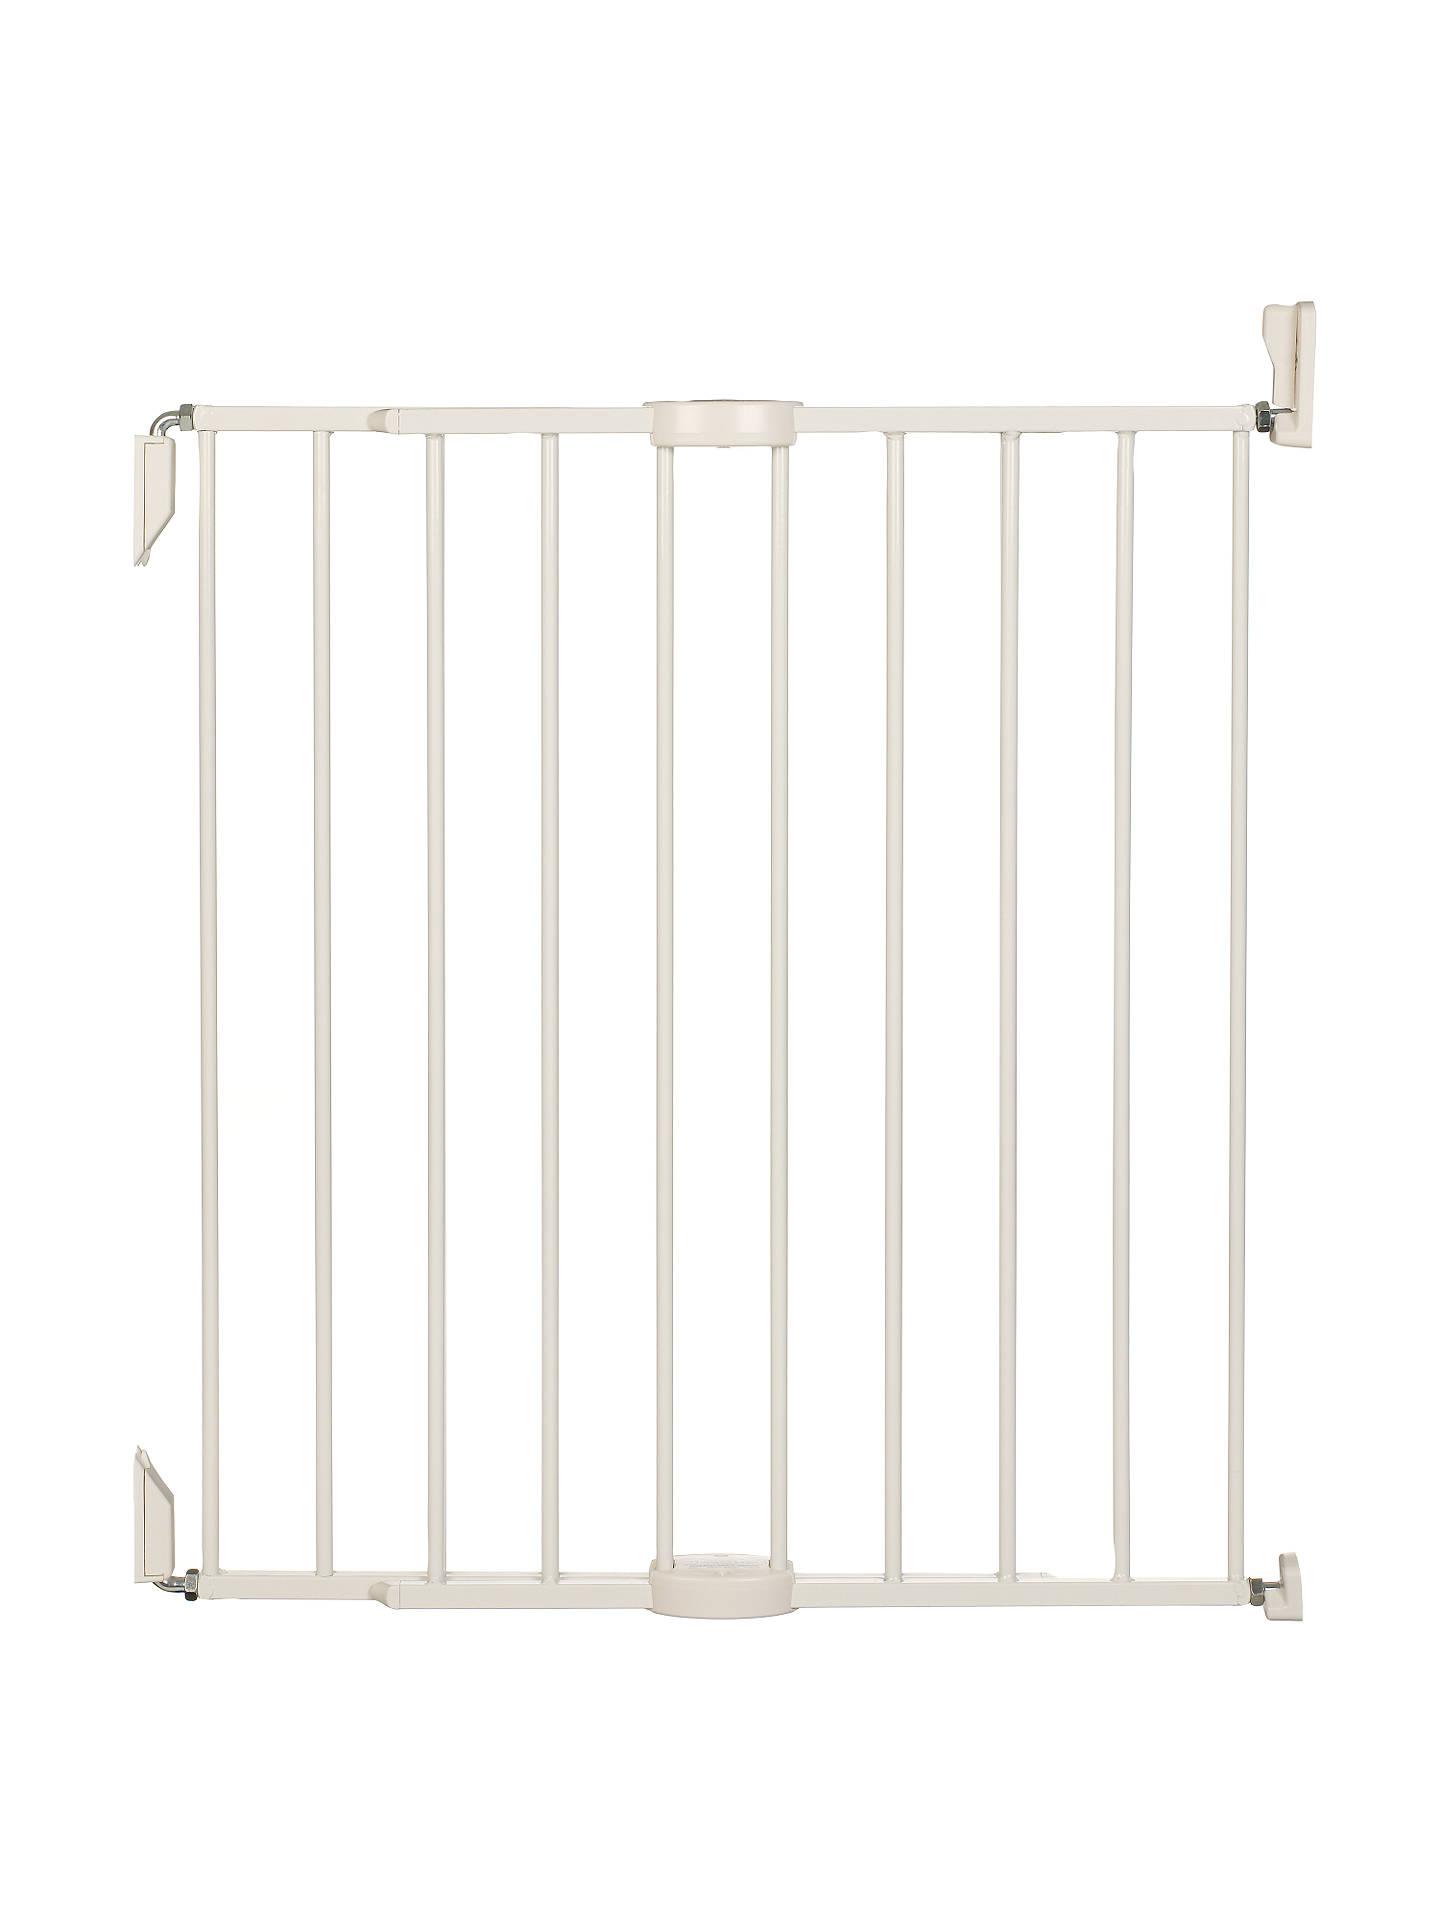 Superbe BuyLindam Extending Metal Stair Gate, White Online At Johnlewis.com